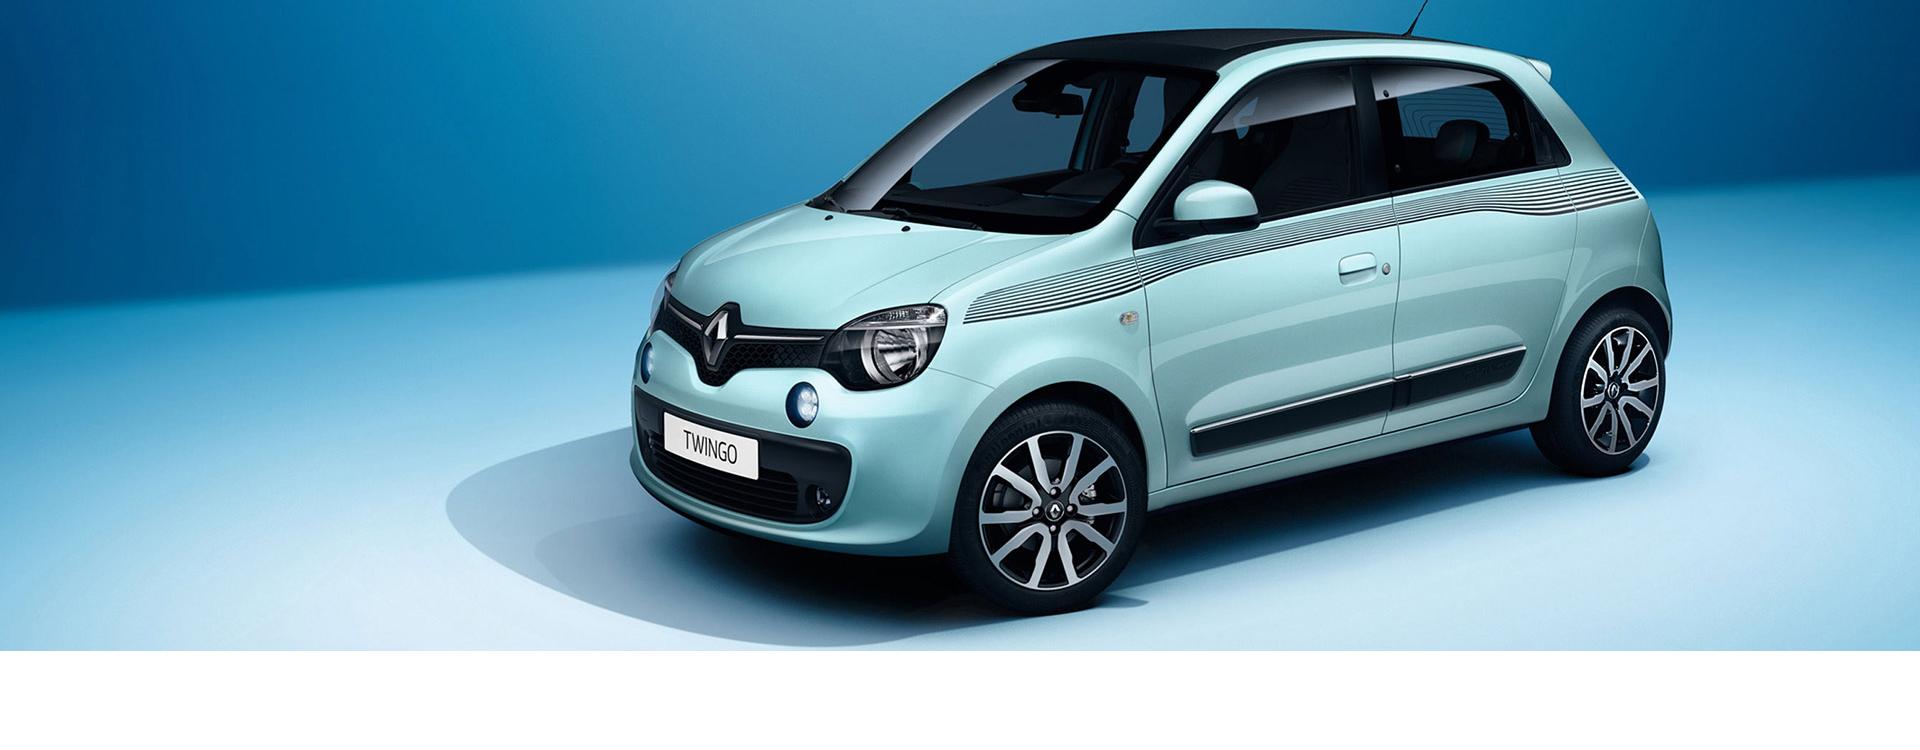 Renault bello automobiles deux garages sartrouville et for Garage mercedes herblay